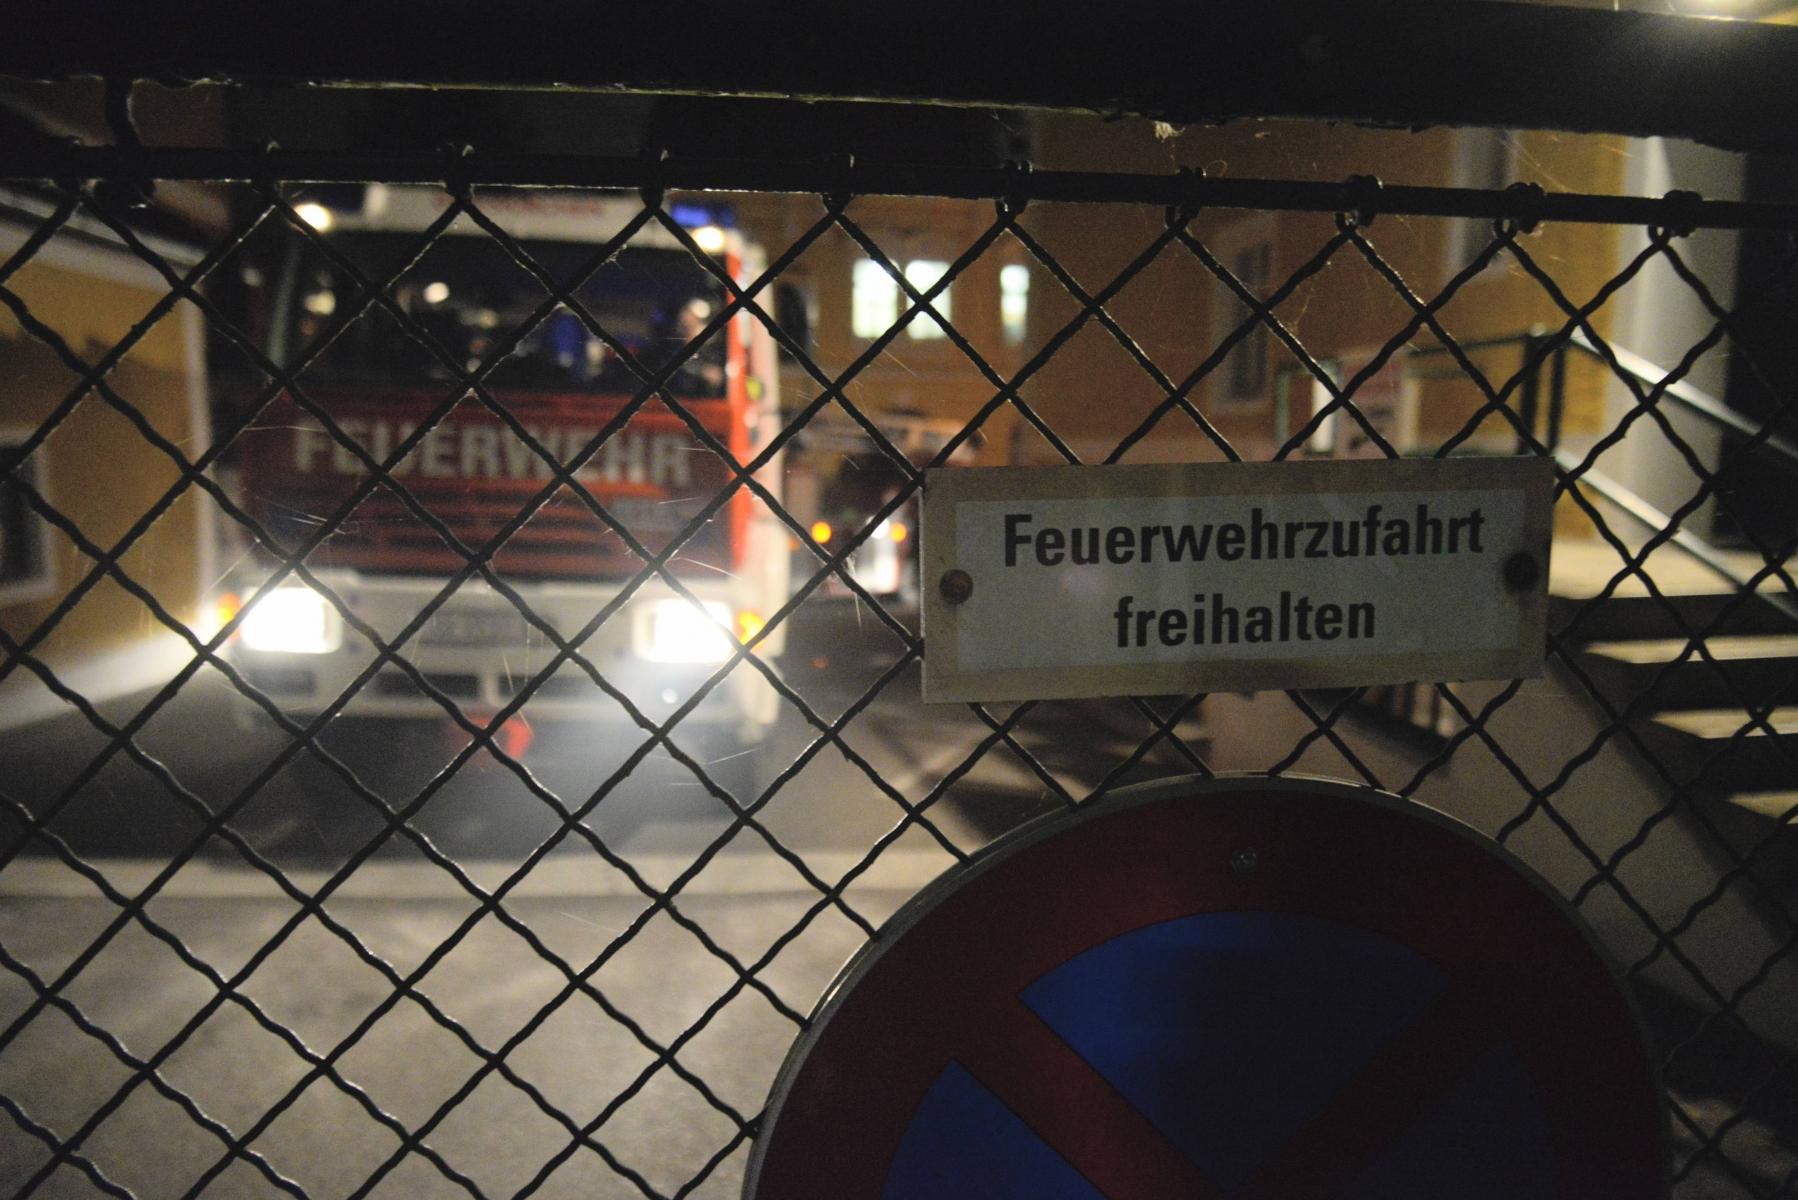 FF_Uebung_Brauerei_GR_0057